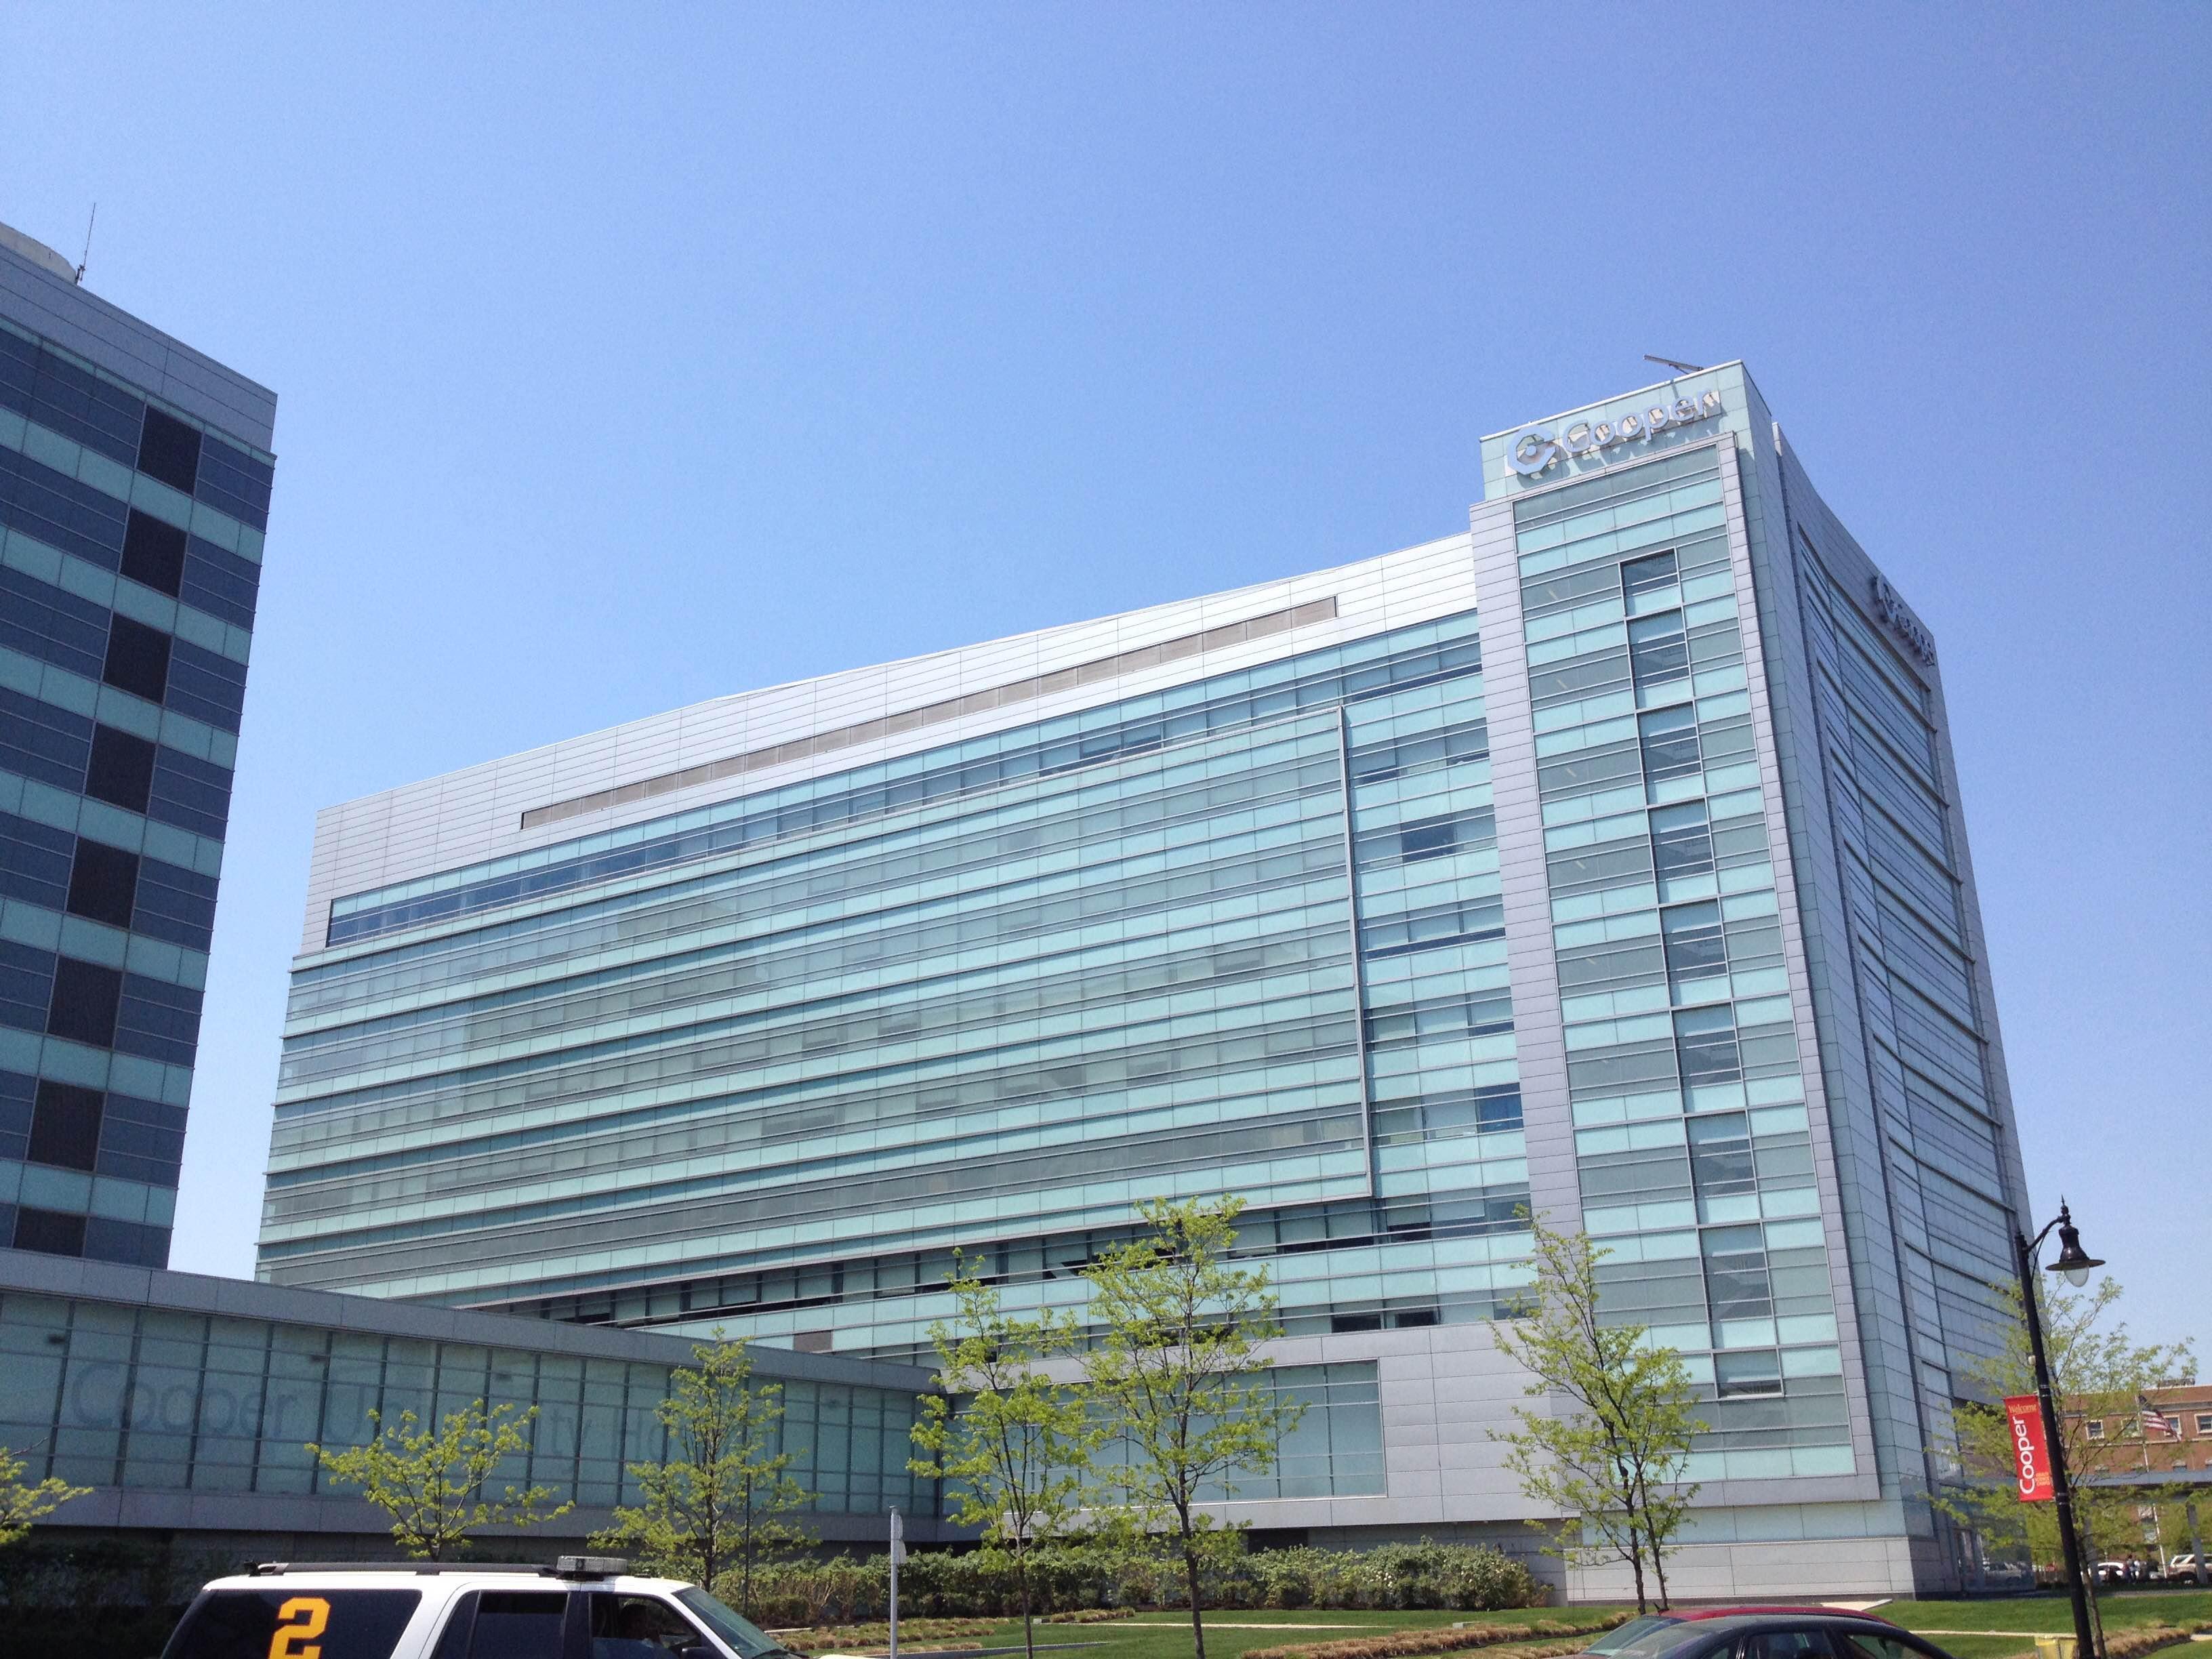 Cooper University Hospital - Wikipedia